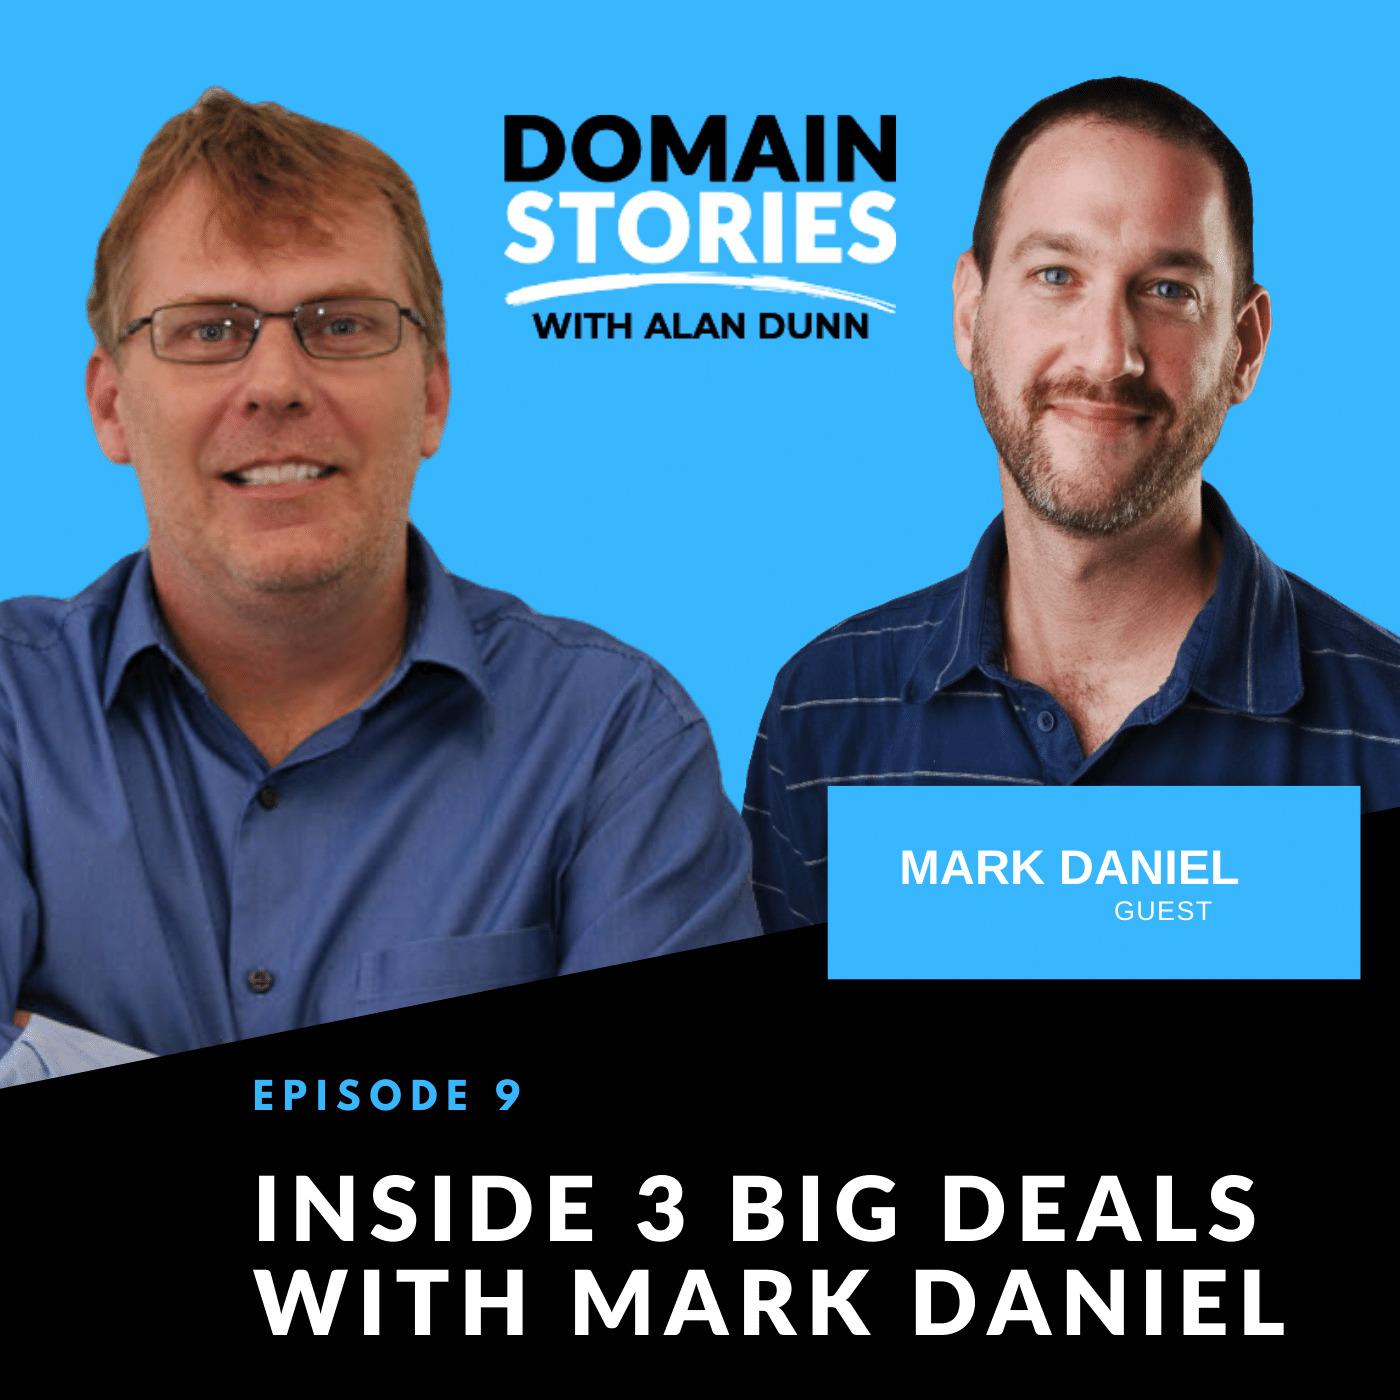 Alan Dunn and Mark Daniel talk about domain names